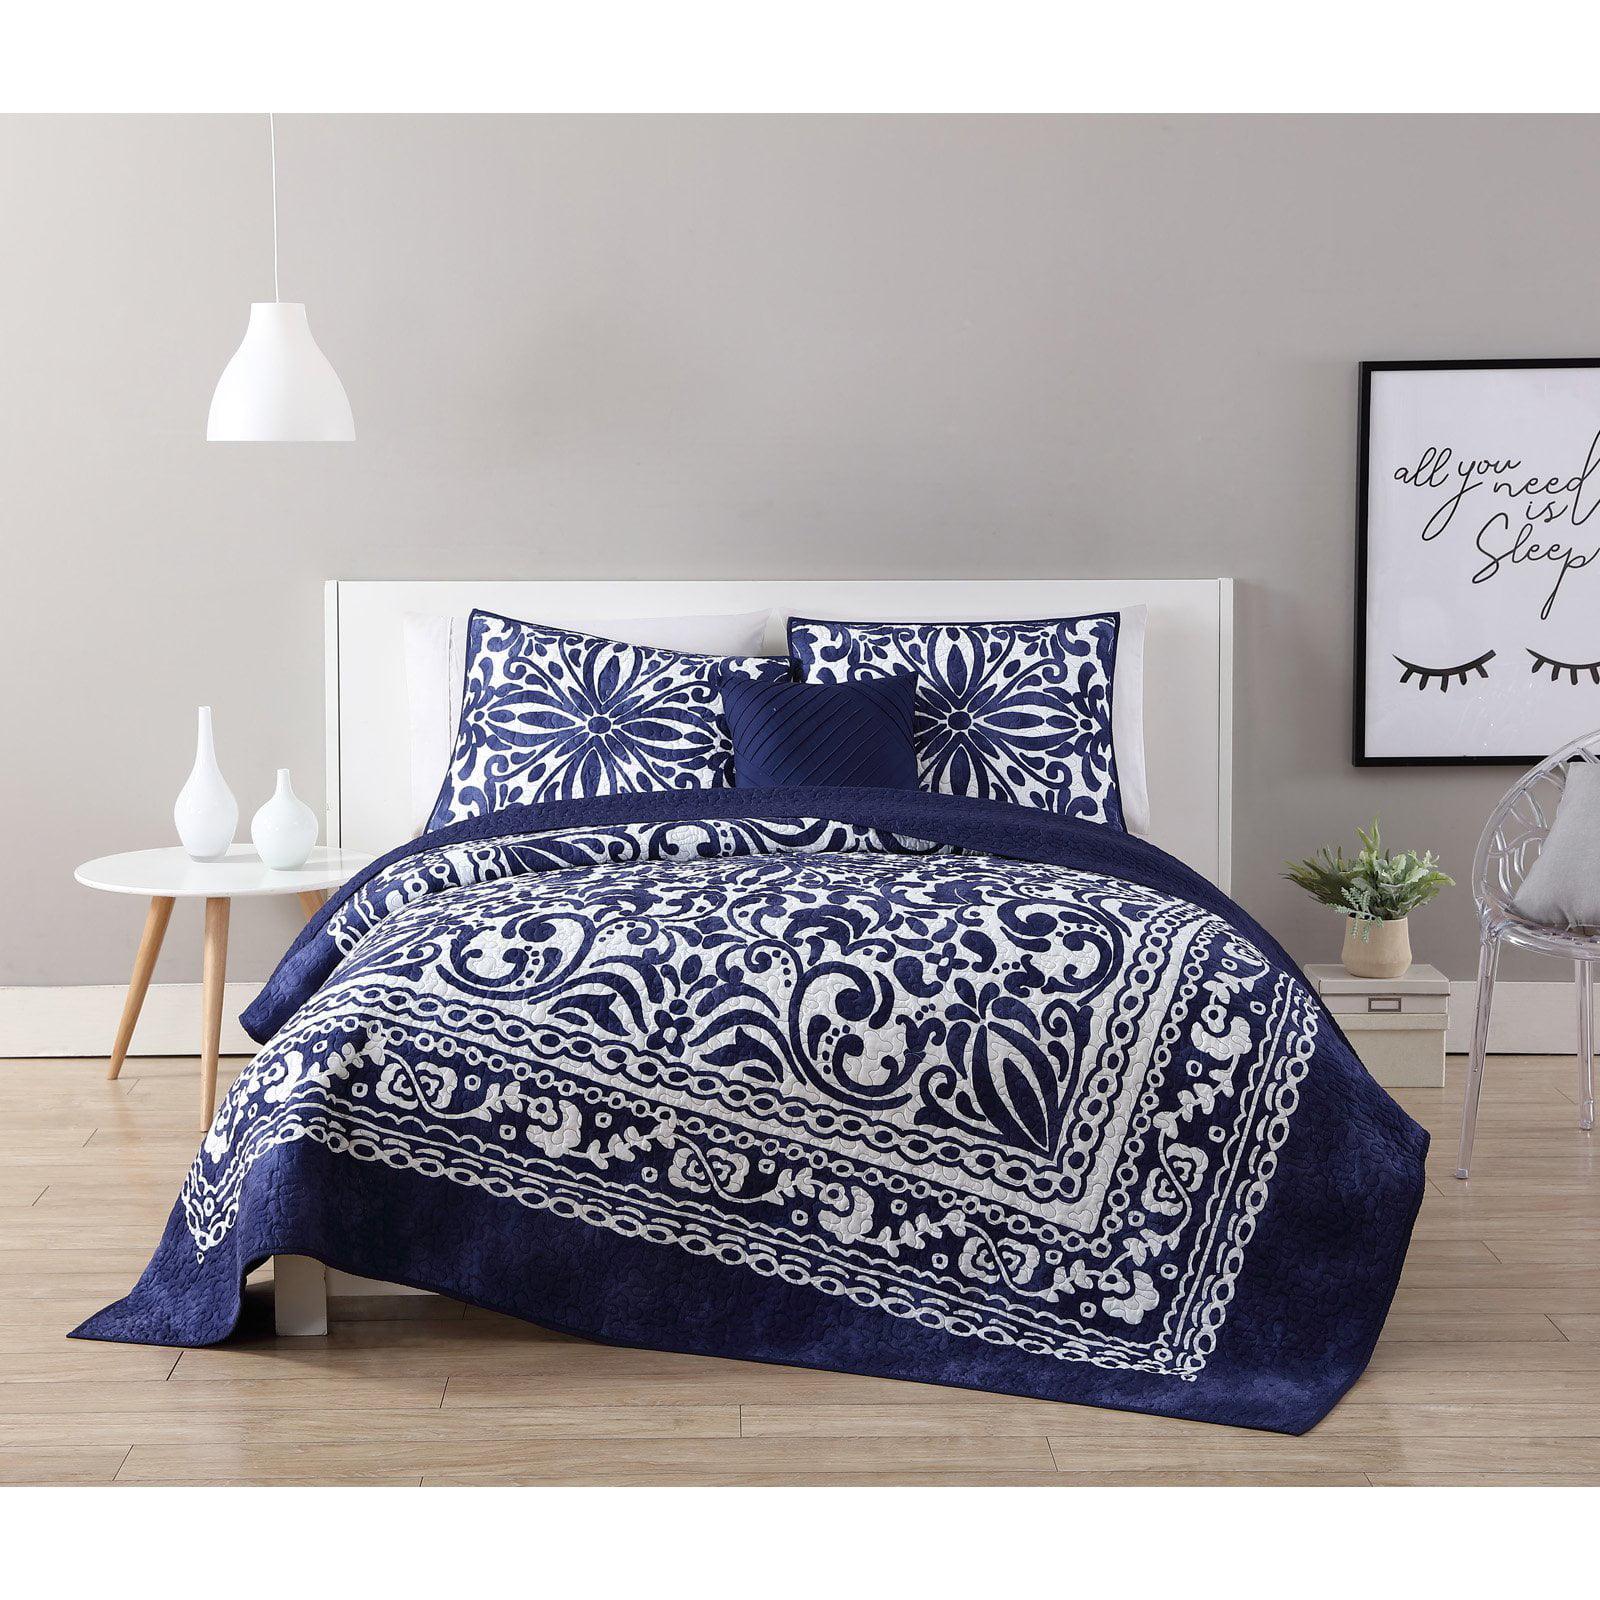 VCNY Home Navy/White Eleanor 3/4-Piece Quilt Bedding Set